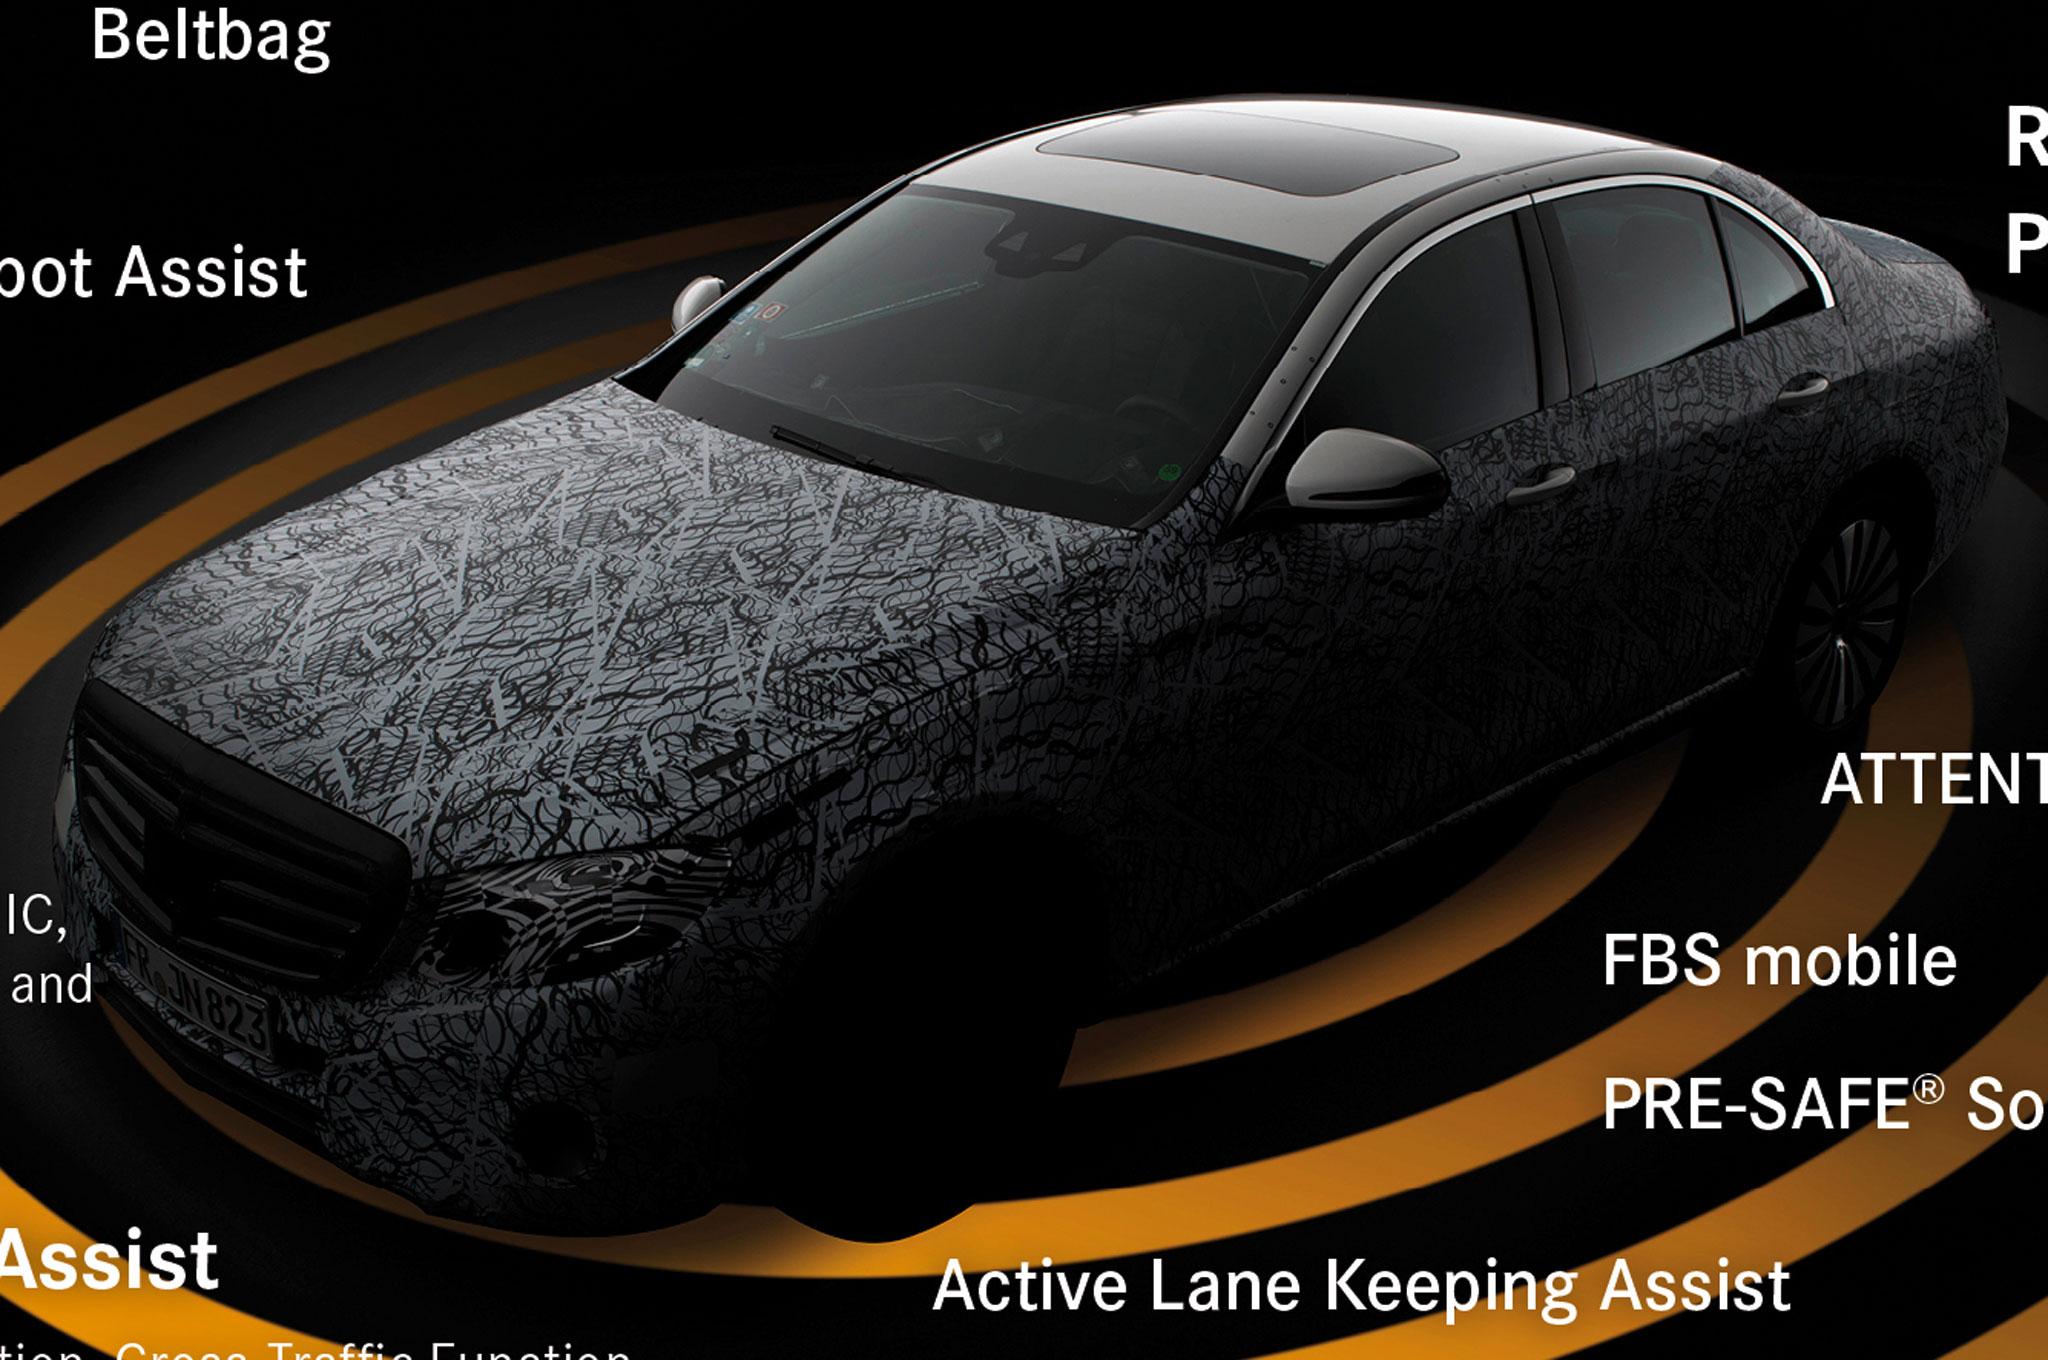 2017 Mercedes Benz E Class Graphic Closeup